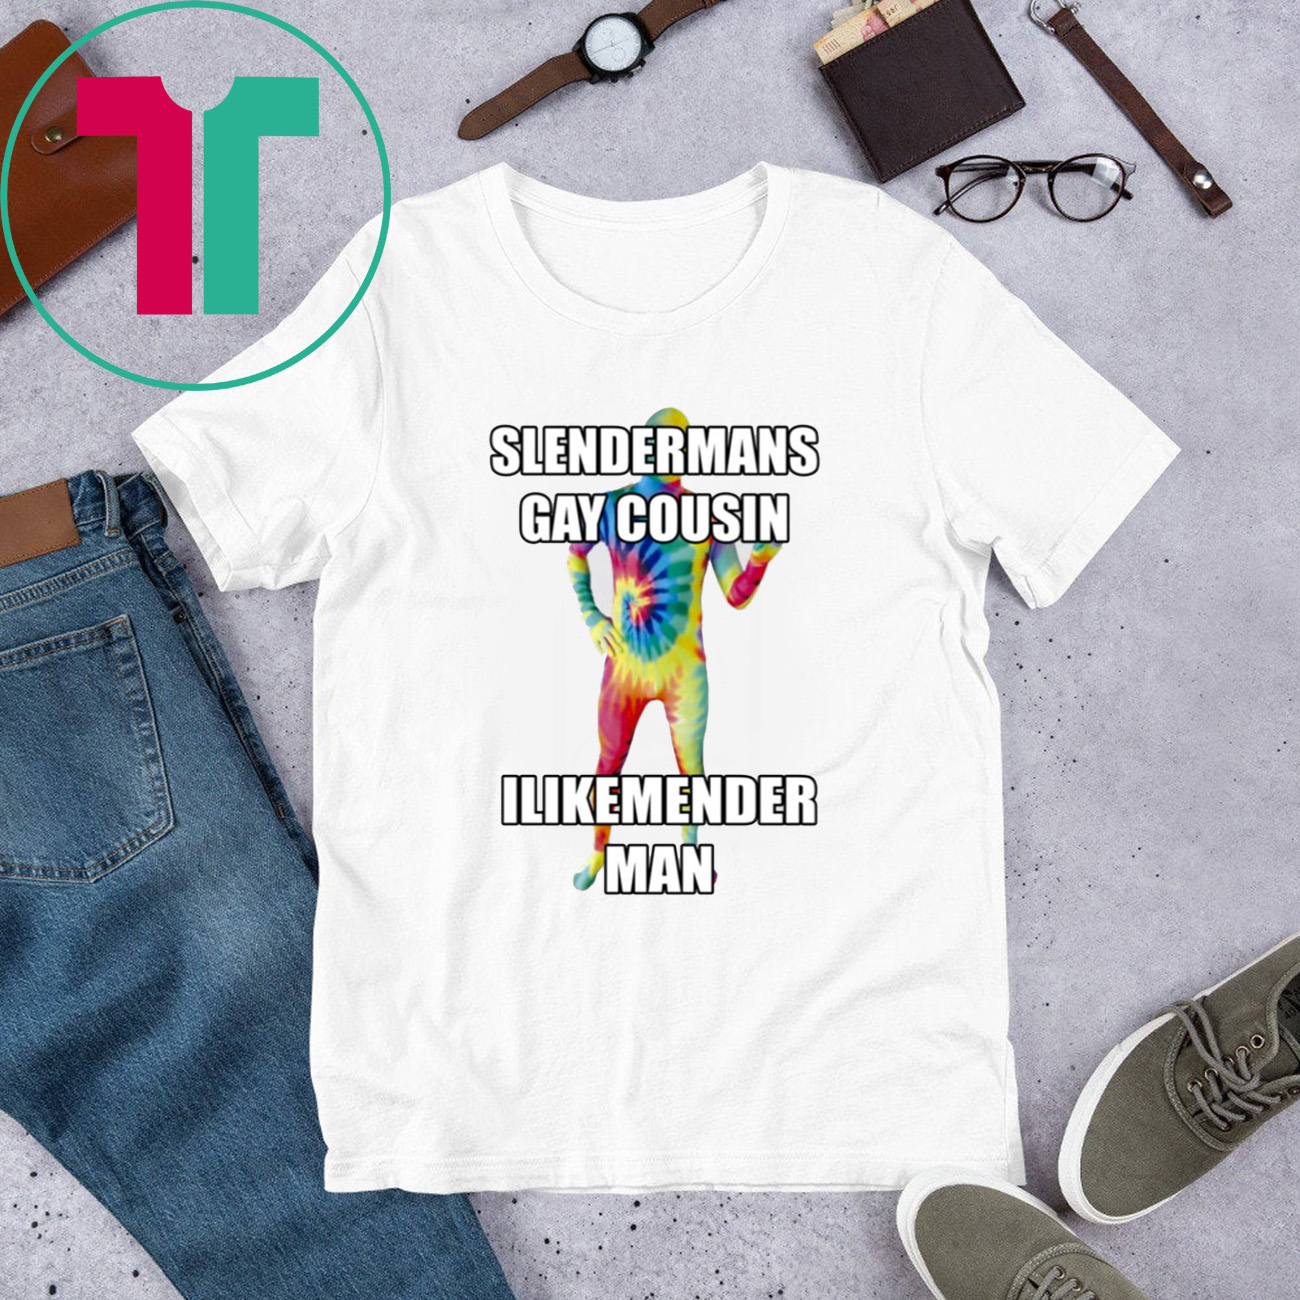 Slenderman Gay Cousin Ilikemender Man T-Shirt